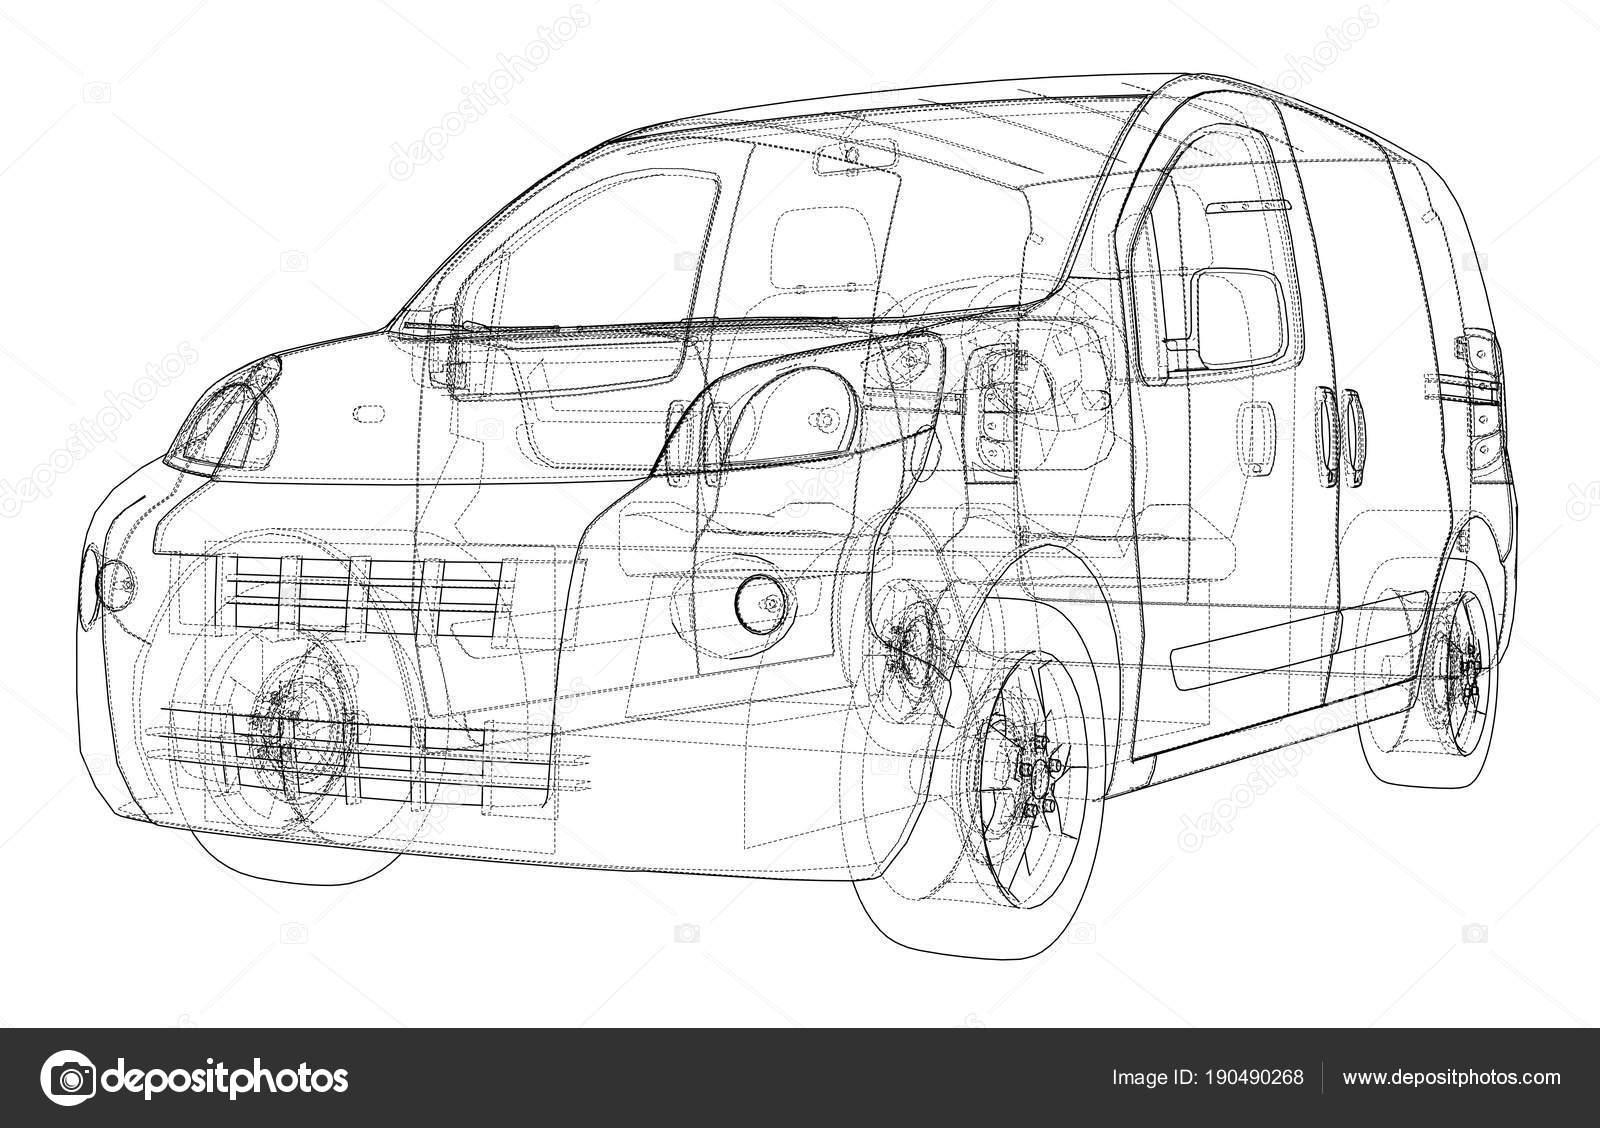 Concept car blueprint — Stock Photo © cherezoff #190490268